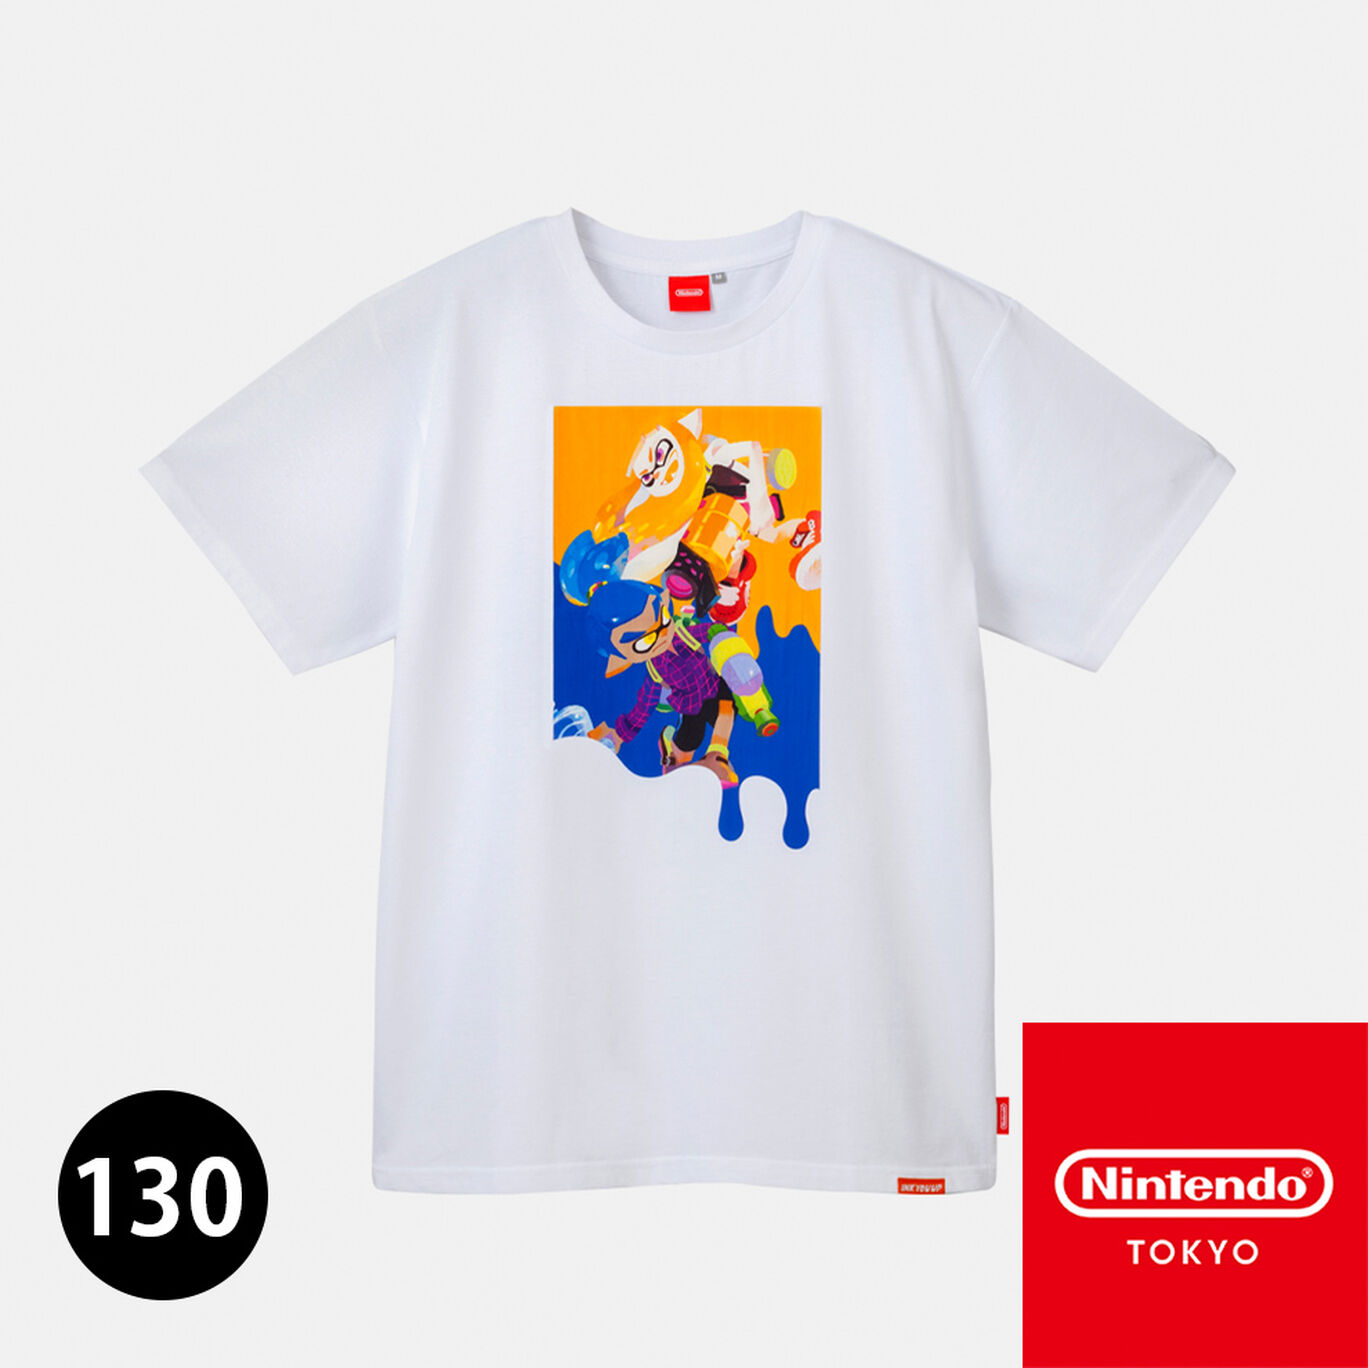 Tシャツ B 130 INK YOU UP【Nintendo TOKYO取り扱い商品】